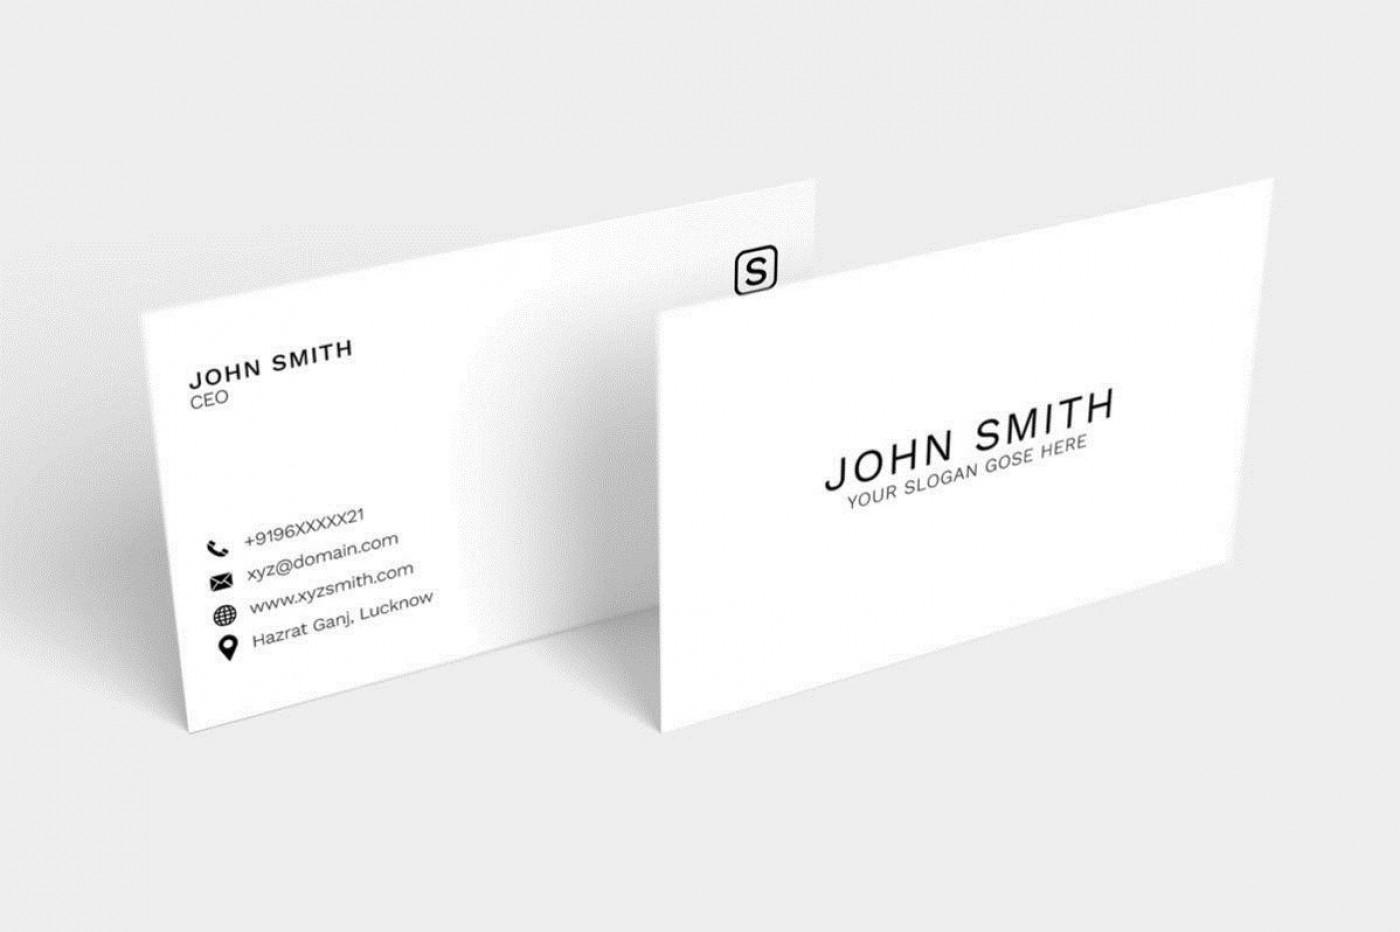 008 Impressive Simple Busines Card Design Template Free Picture  Minimalist Psd Download1400